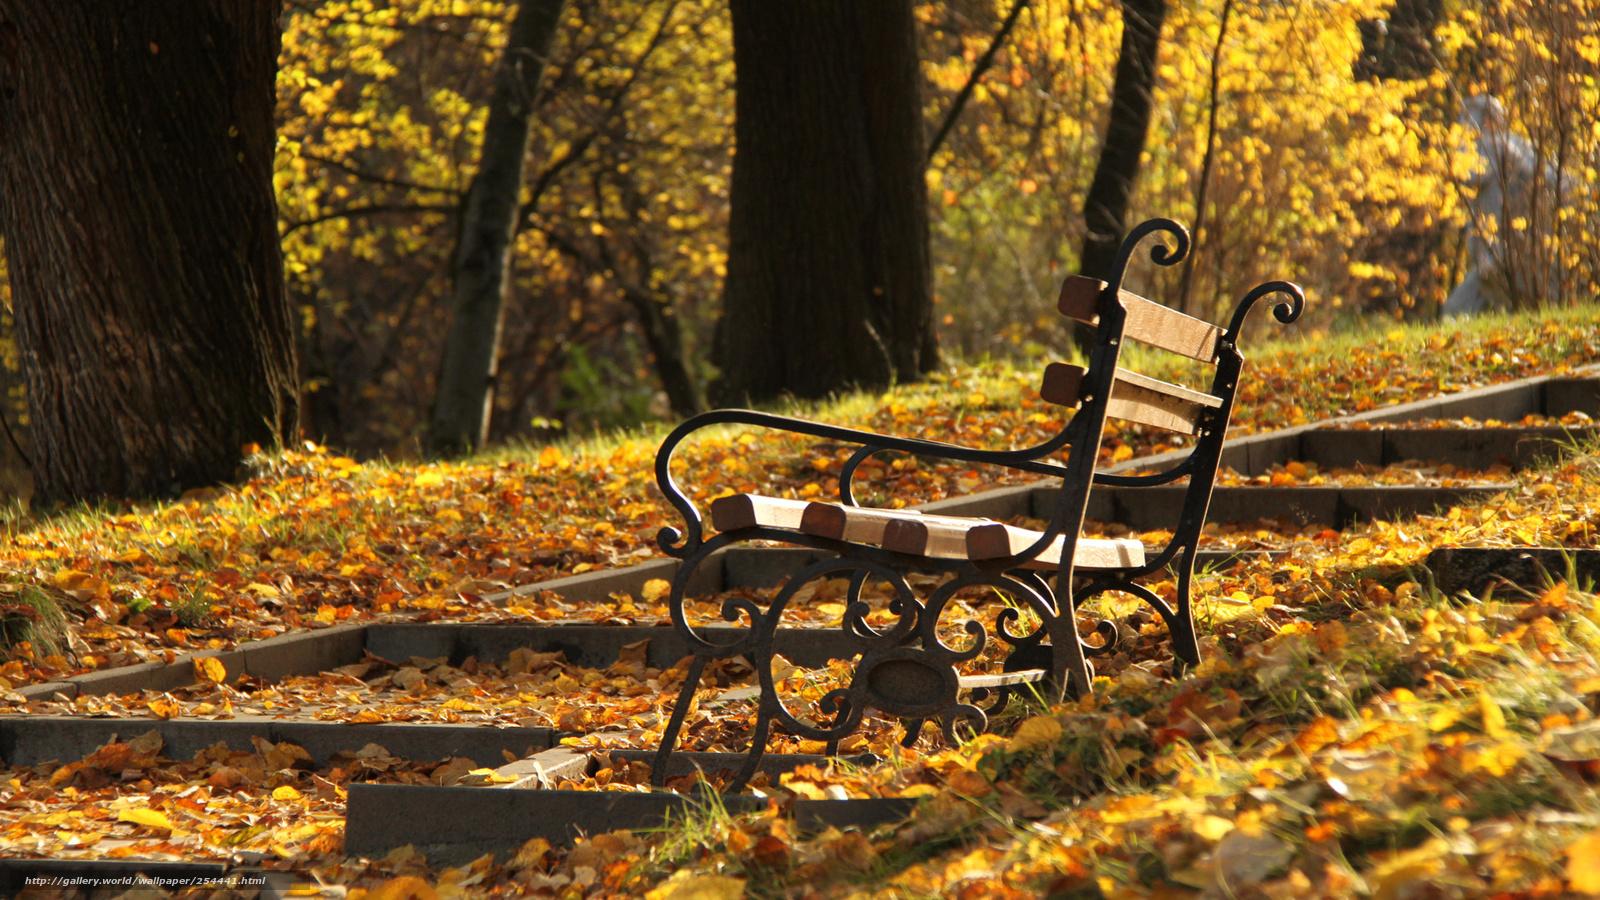 Scaricare gli sfondi parco panchina autunno sfondi for Sfondi desktop autunno